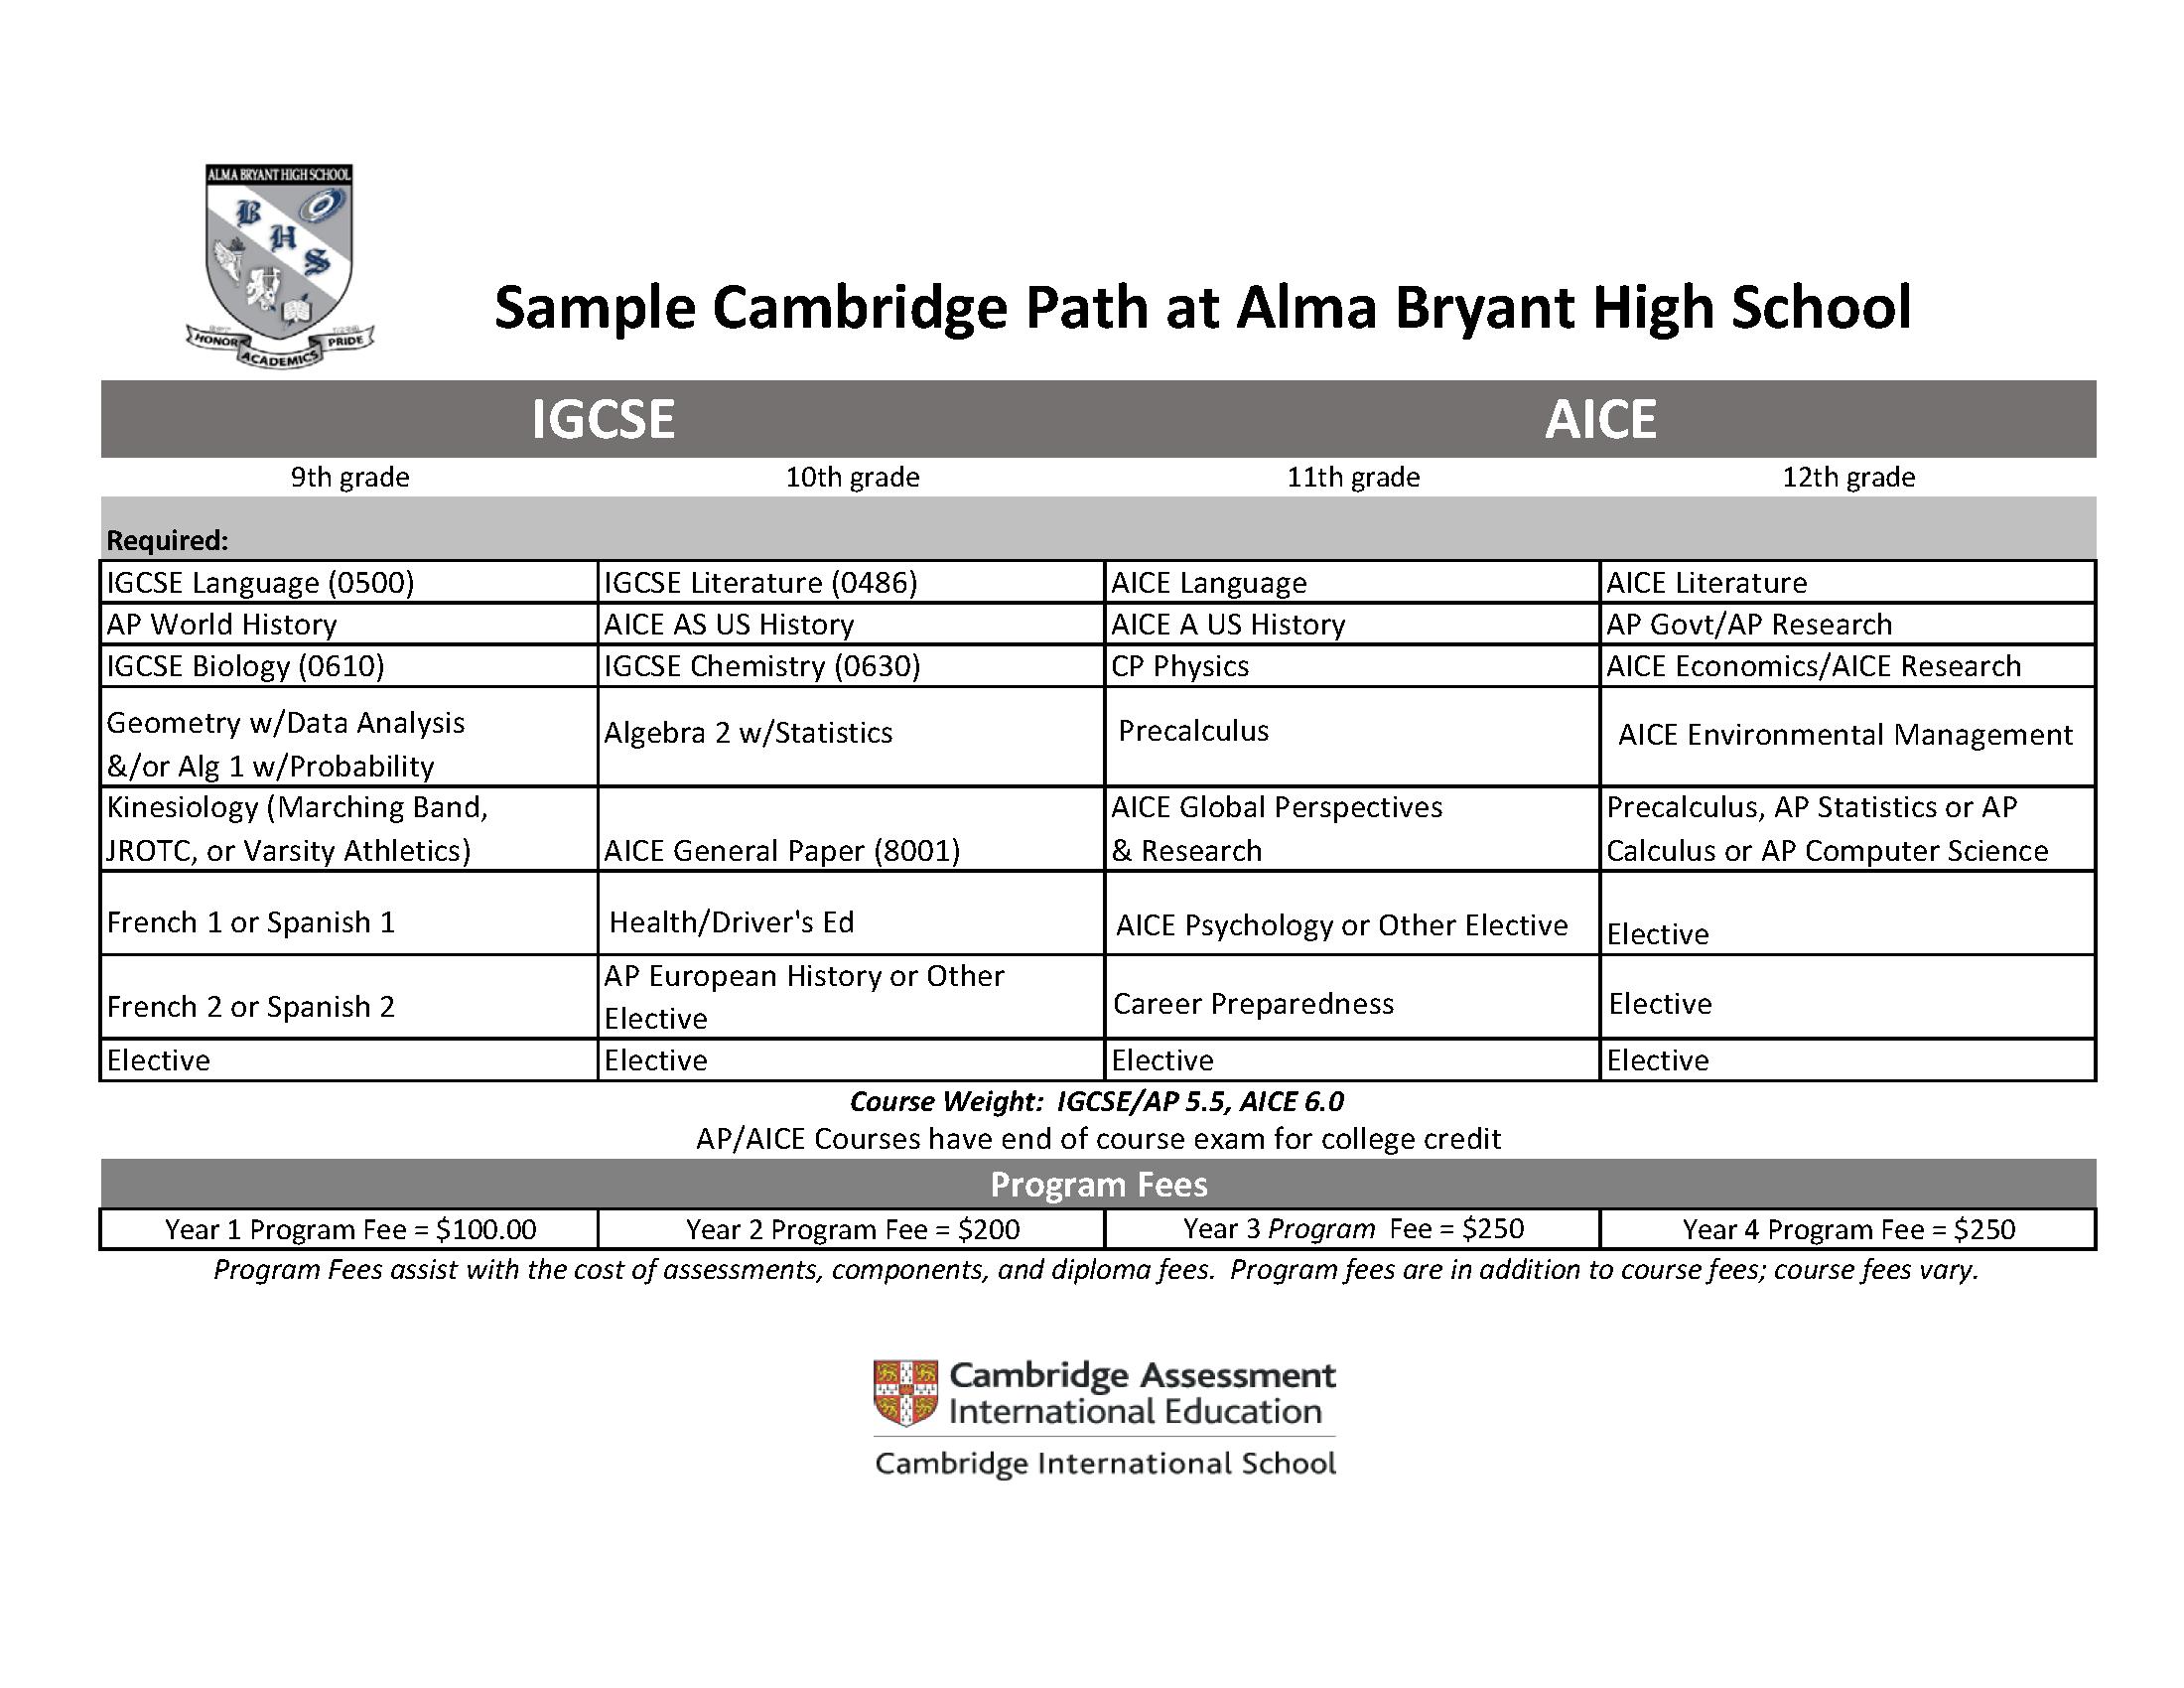 Cambridge 4 year plan